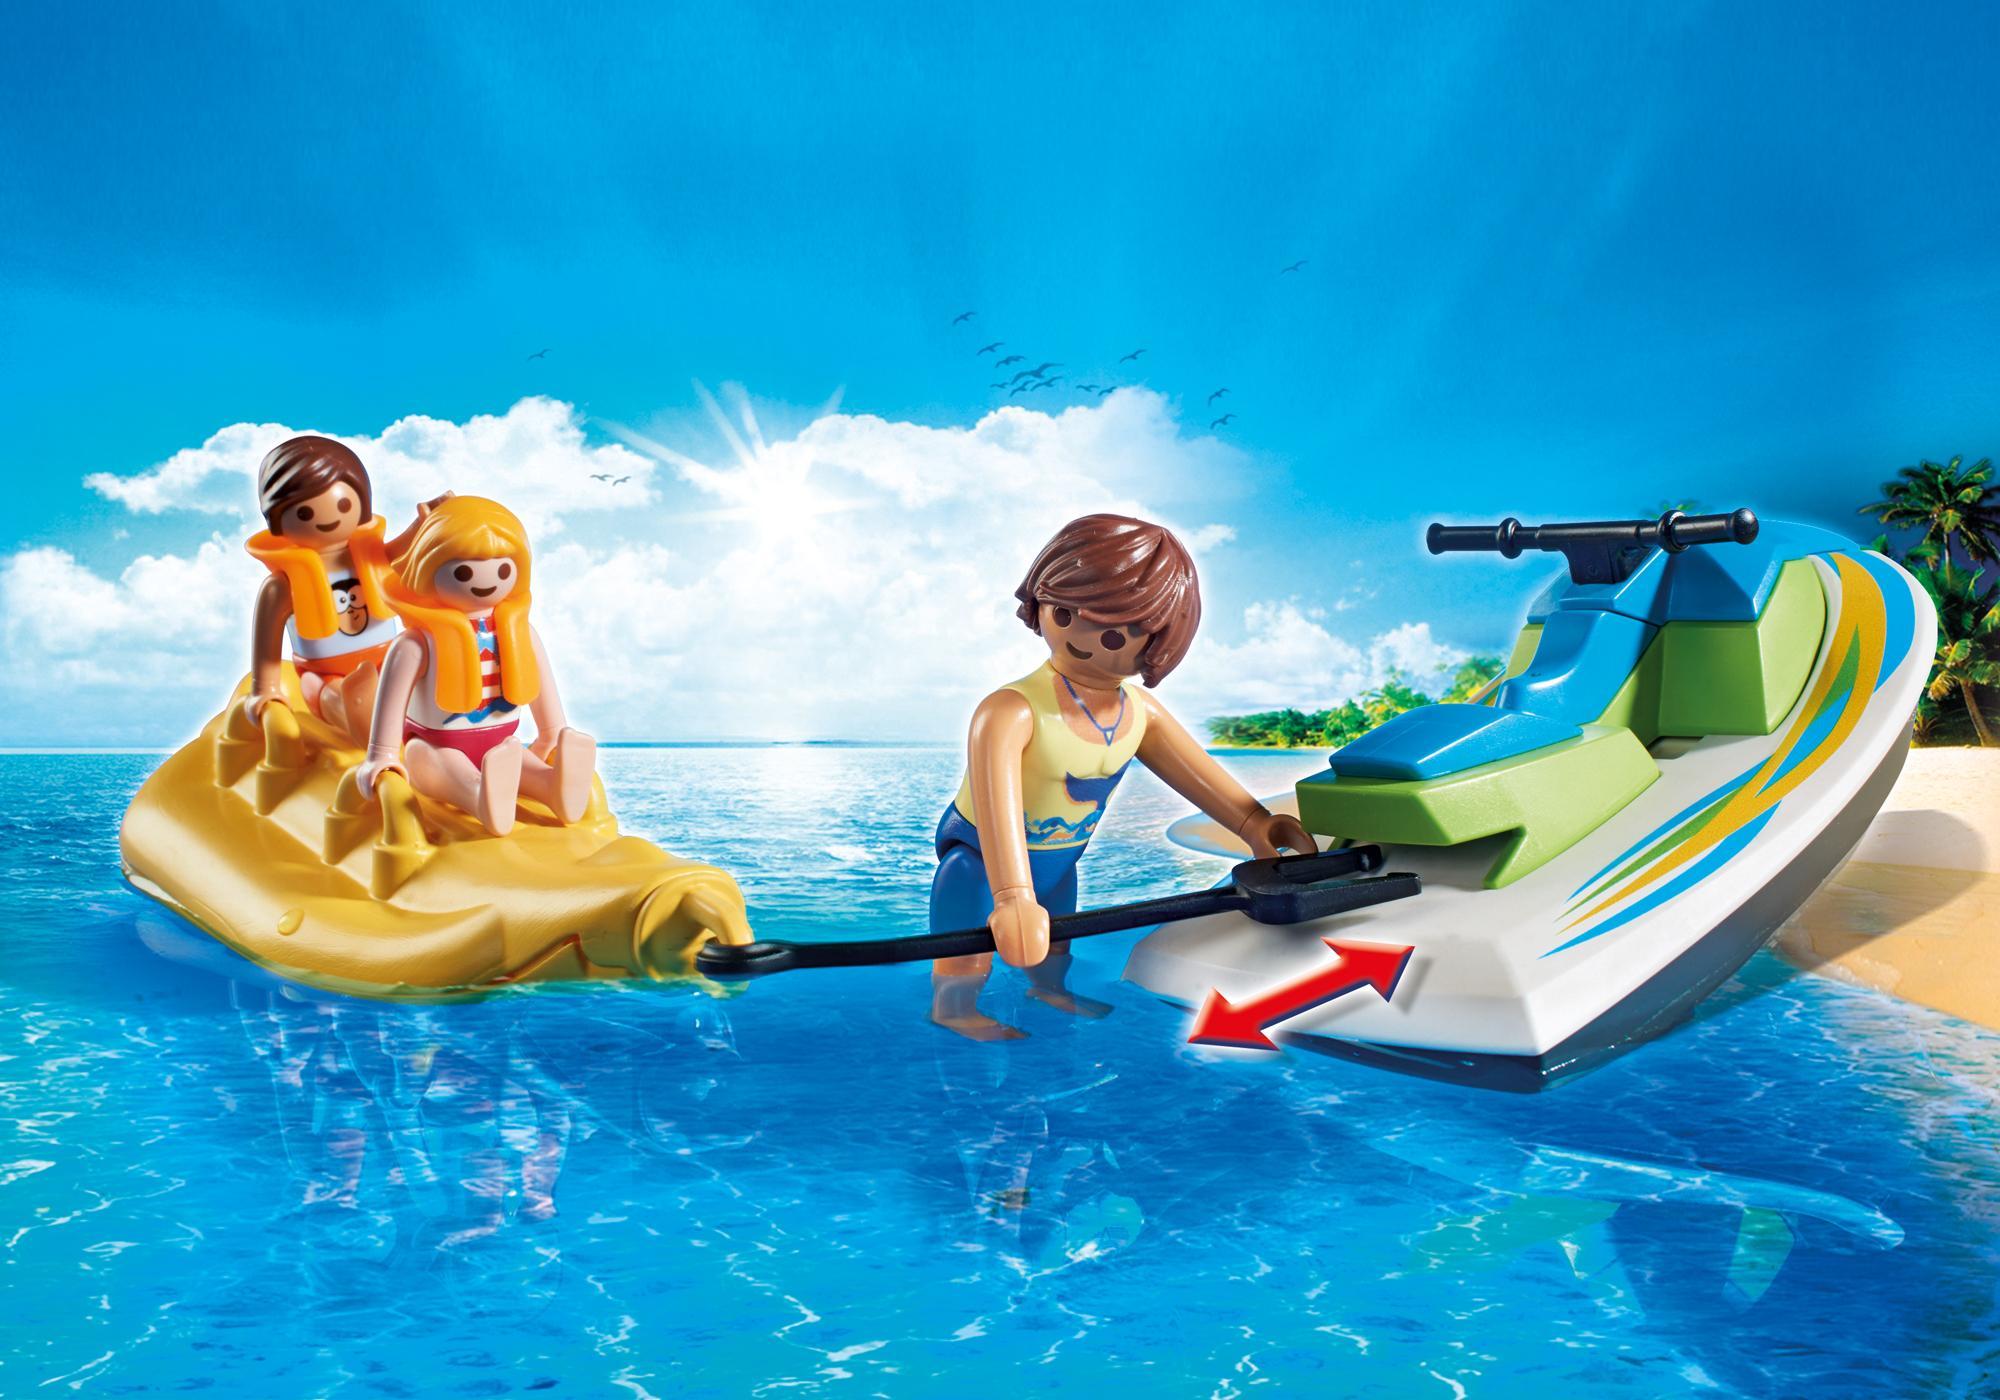 http://media.playmobil.com/i/playmobil/6980_product_extra1/Personal Watercraft with Banana Boat